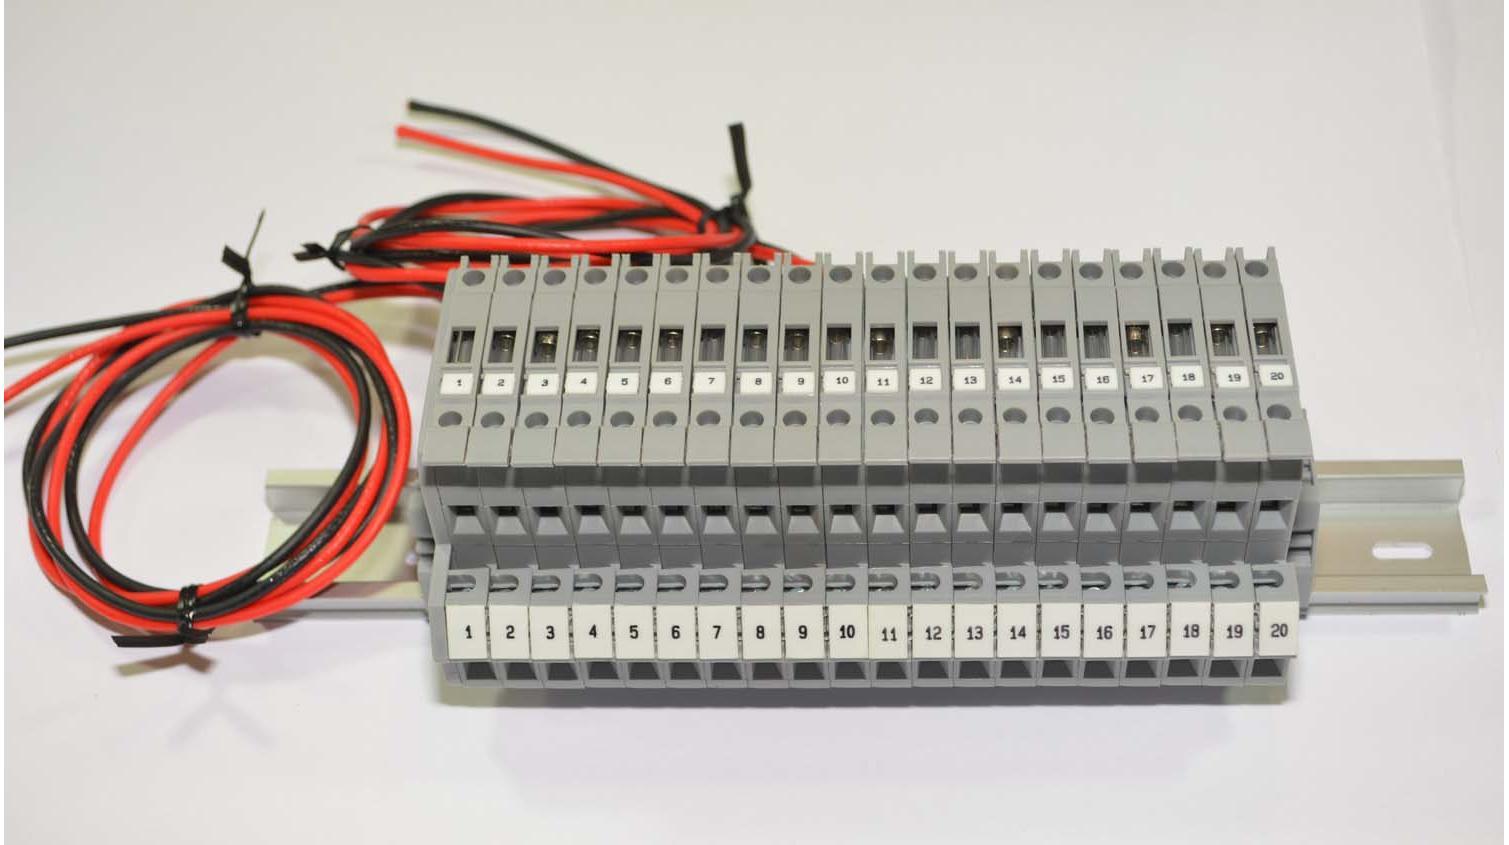 Altech DDFL4U-A20 Double Level Fused DIN Rail Terminal Block Assembly - 20  Position